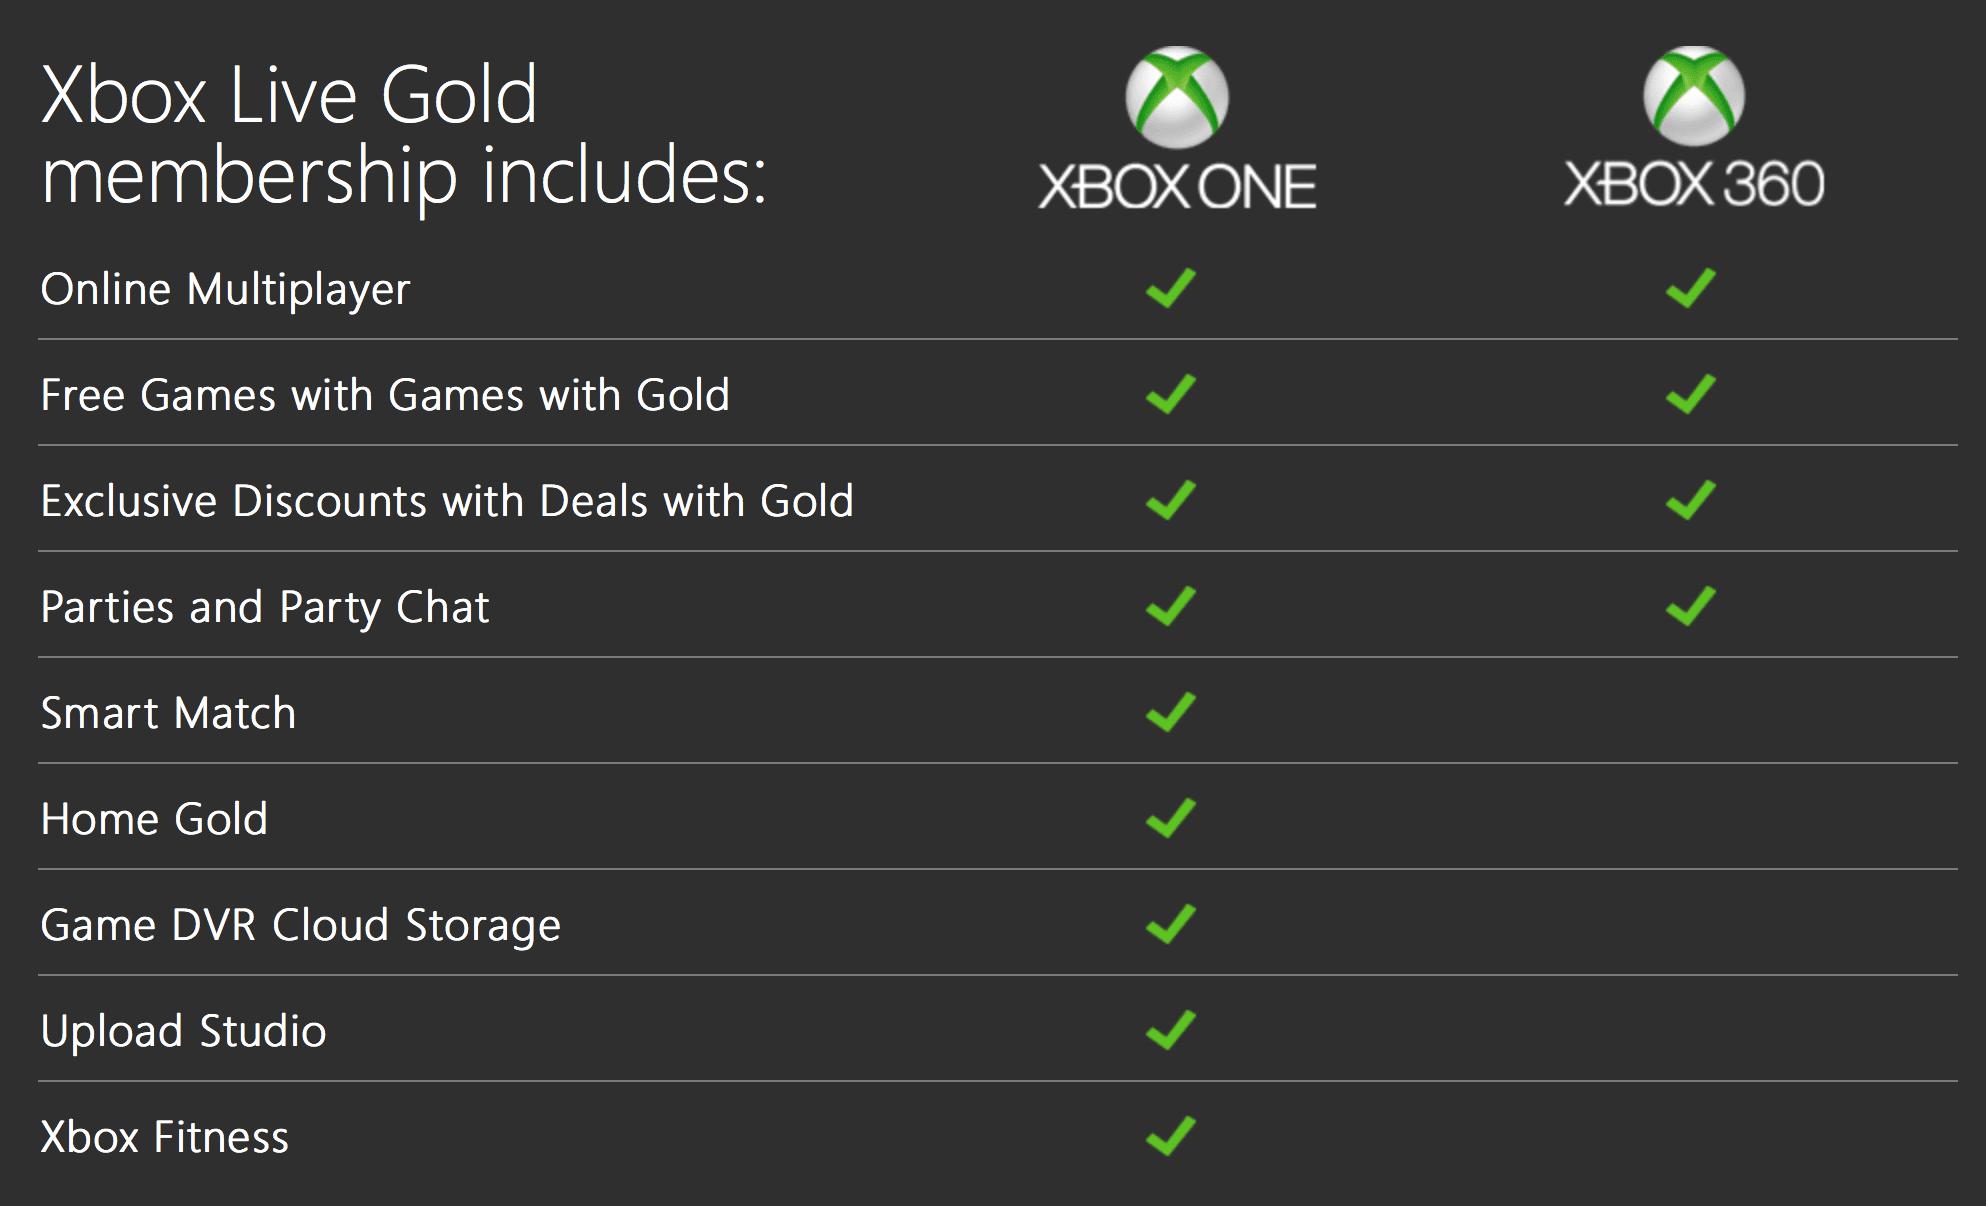 https://www.xbox.com/en-US/live/gold